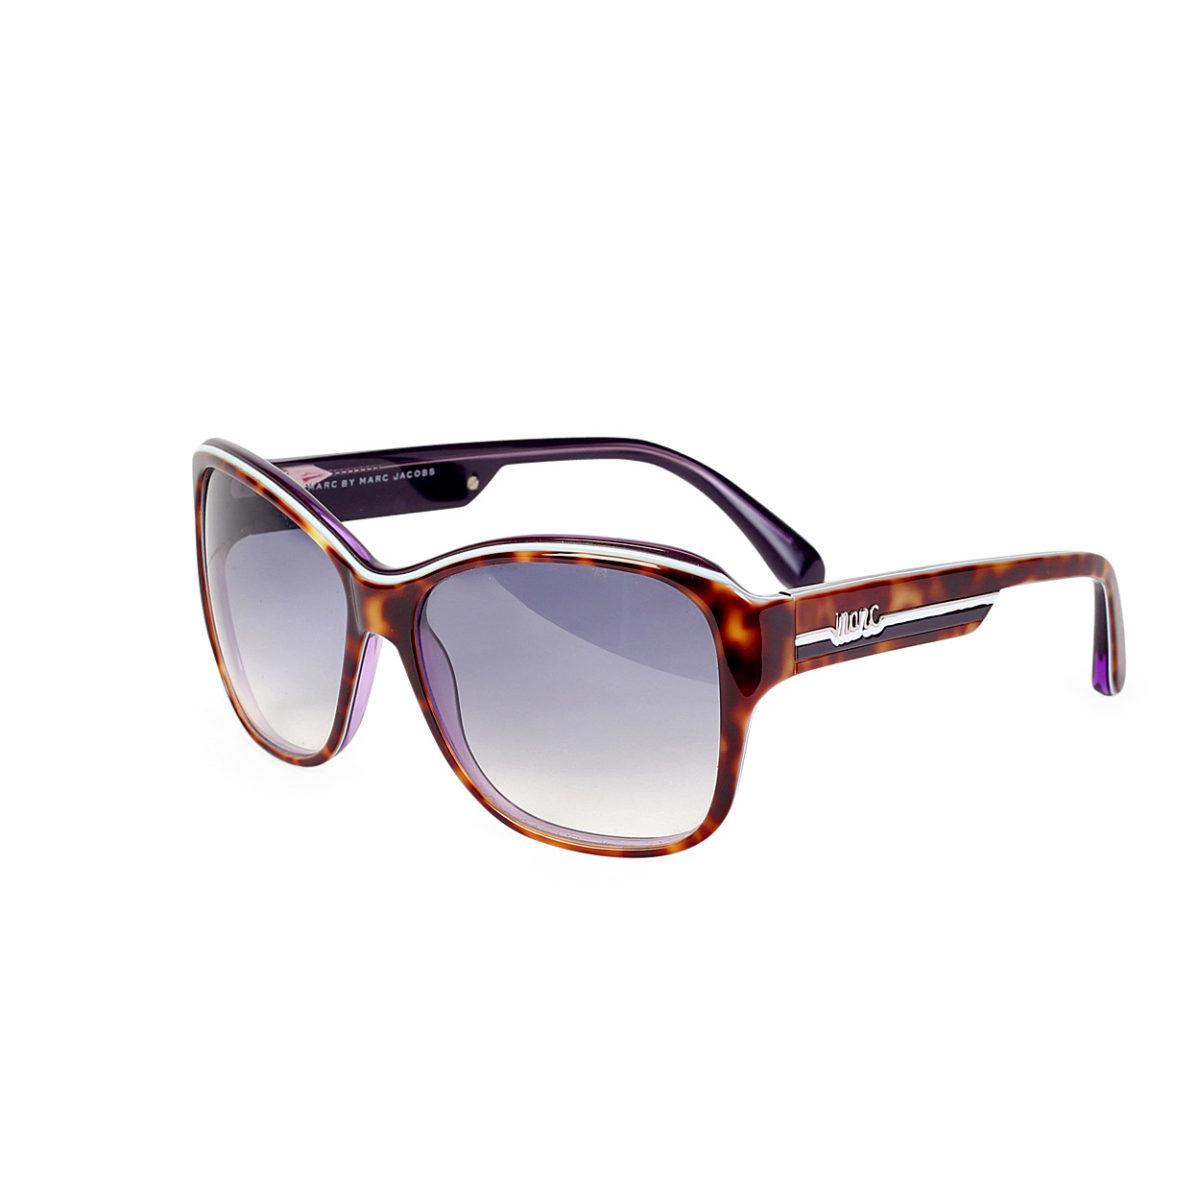 d841dc58f4 Balenciaga Tortoiseshell Cat Eye Sunglasses